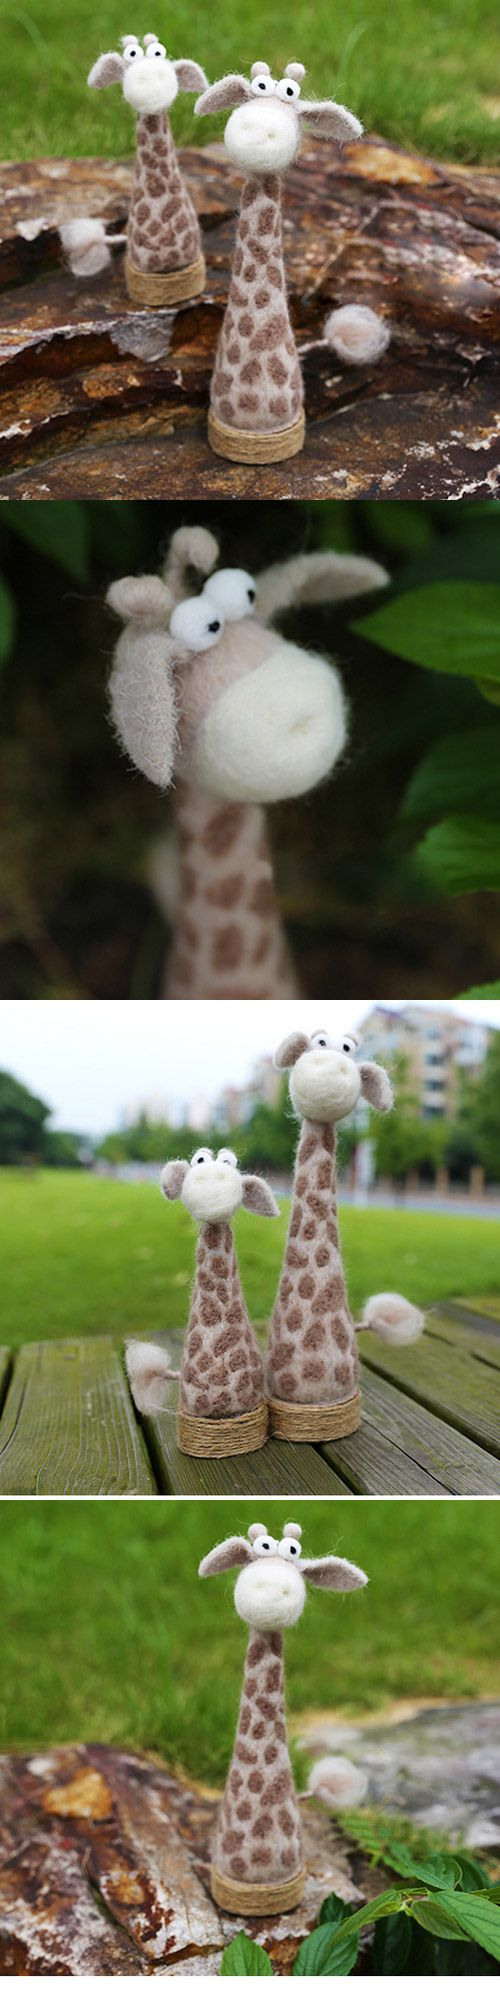 Handmade Needle felted felting project cute animal giraffe ornament felted doll